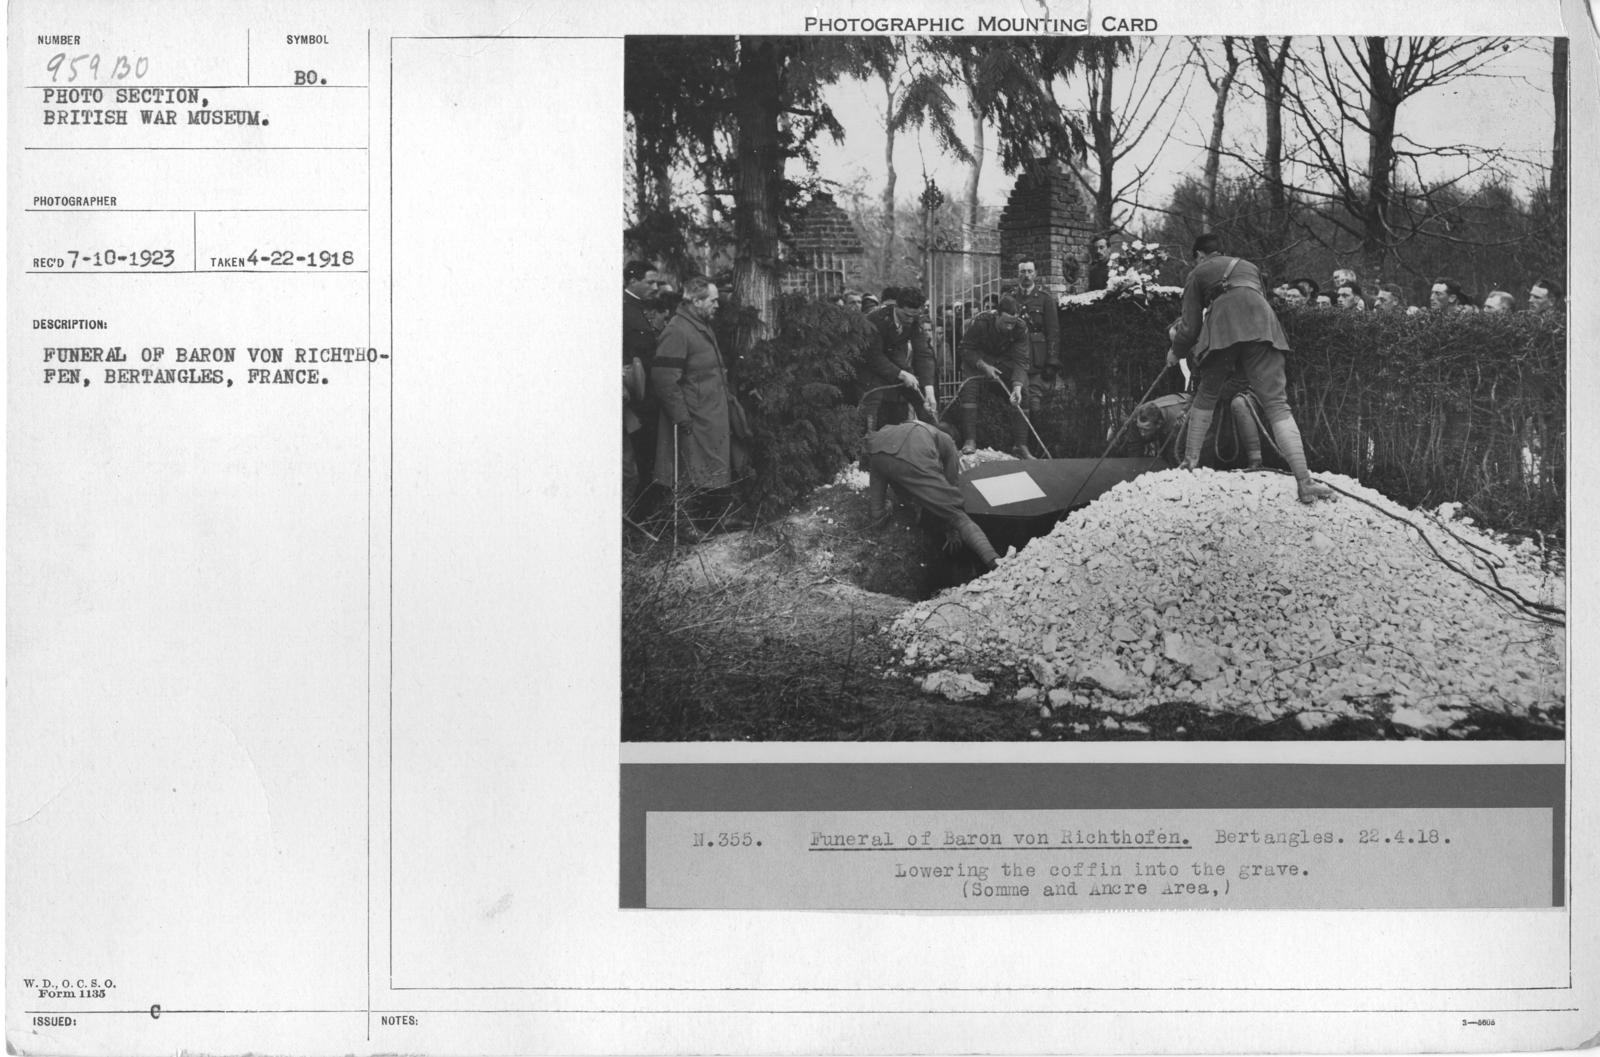 Funeral of Baron Von Richthofen, Bertangles, France. 4-22-1918